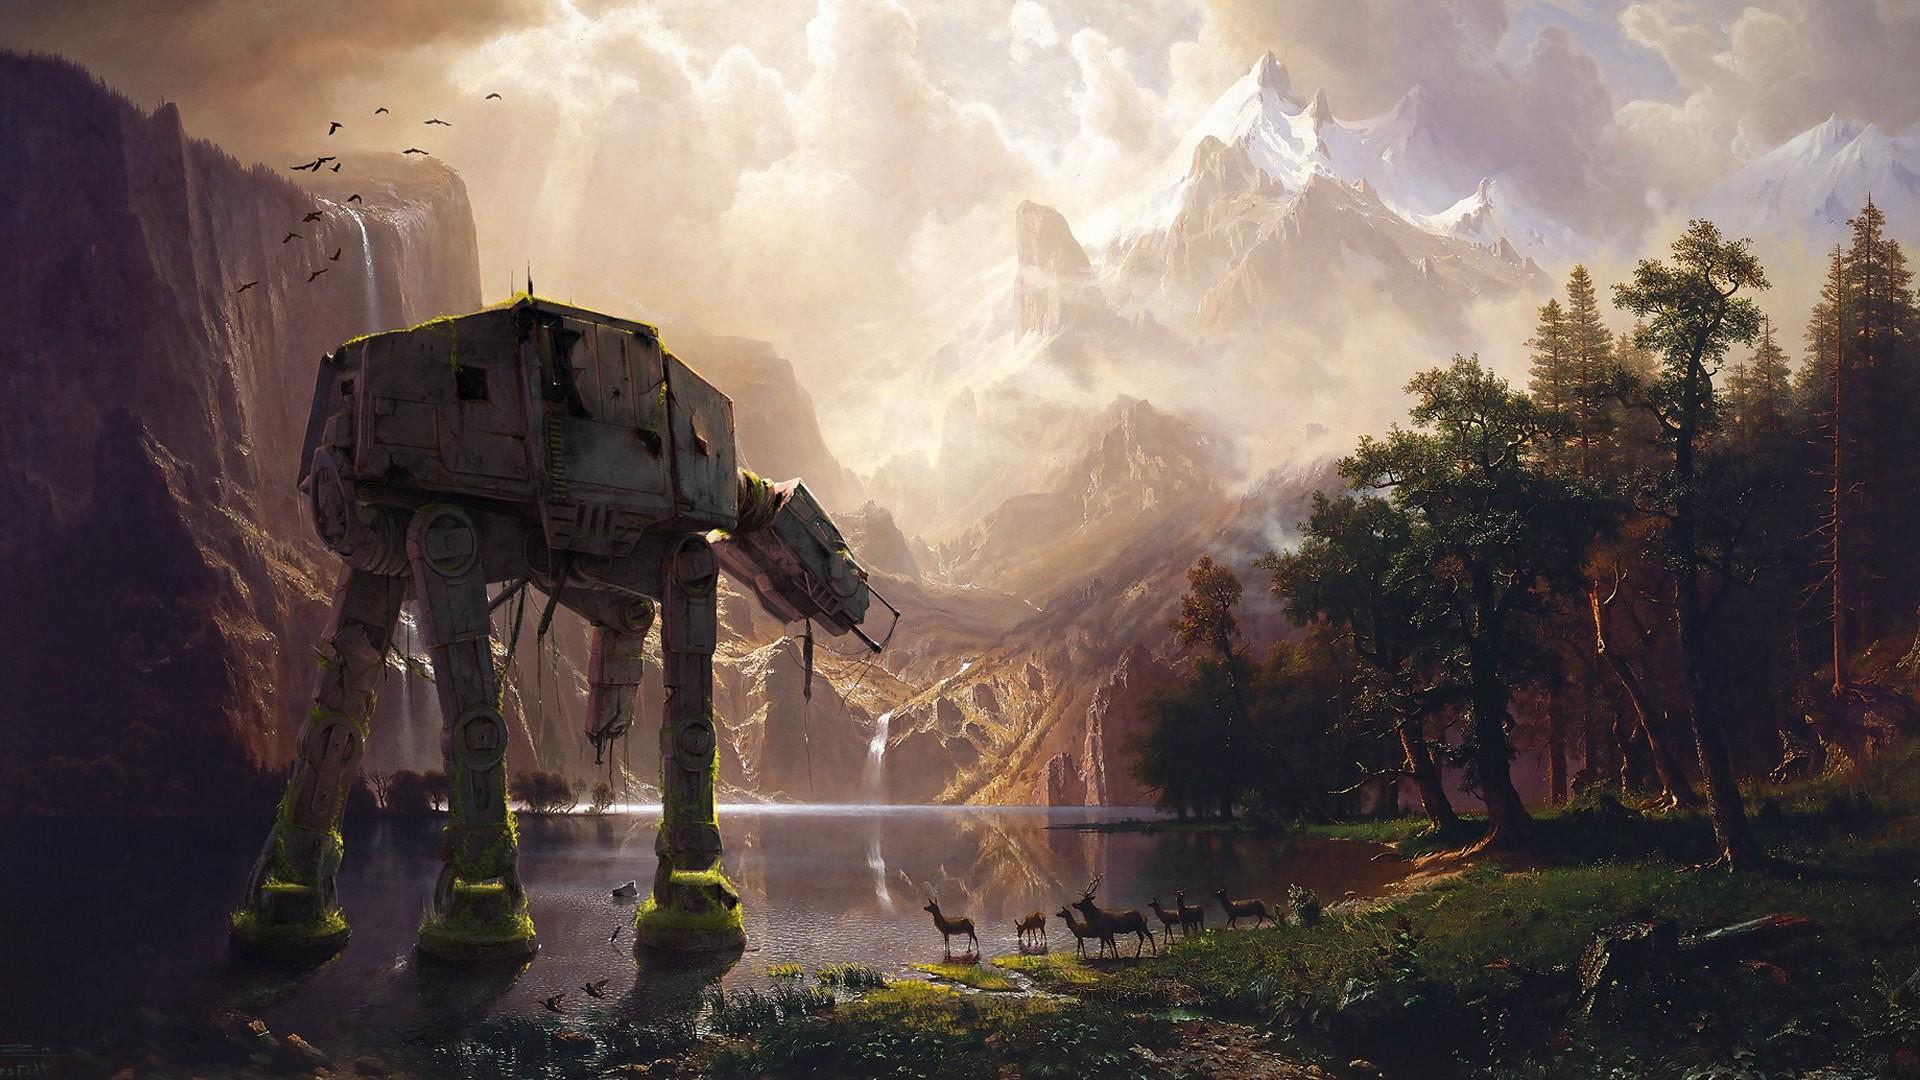 Res: 1920x1080, star wars giant robot concept art hd wallpaper